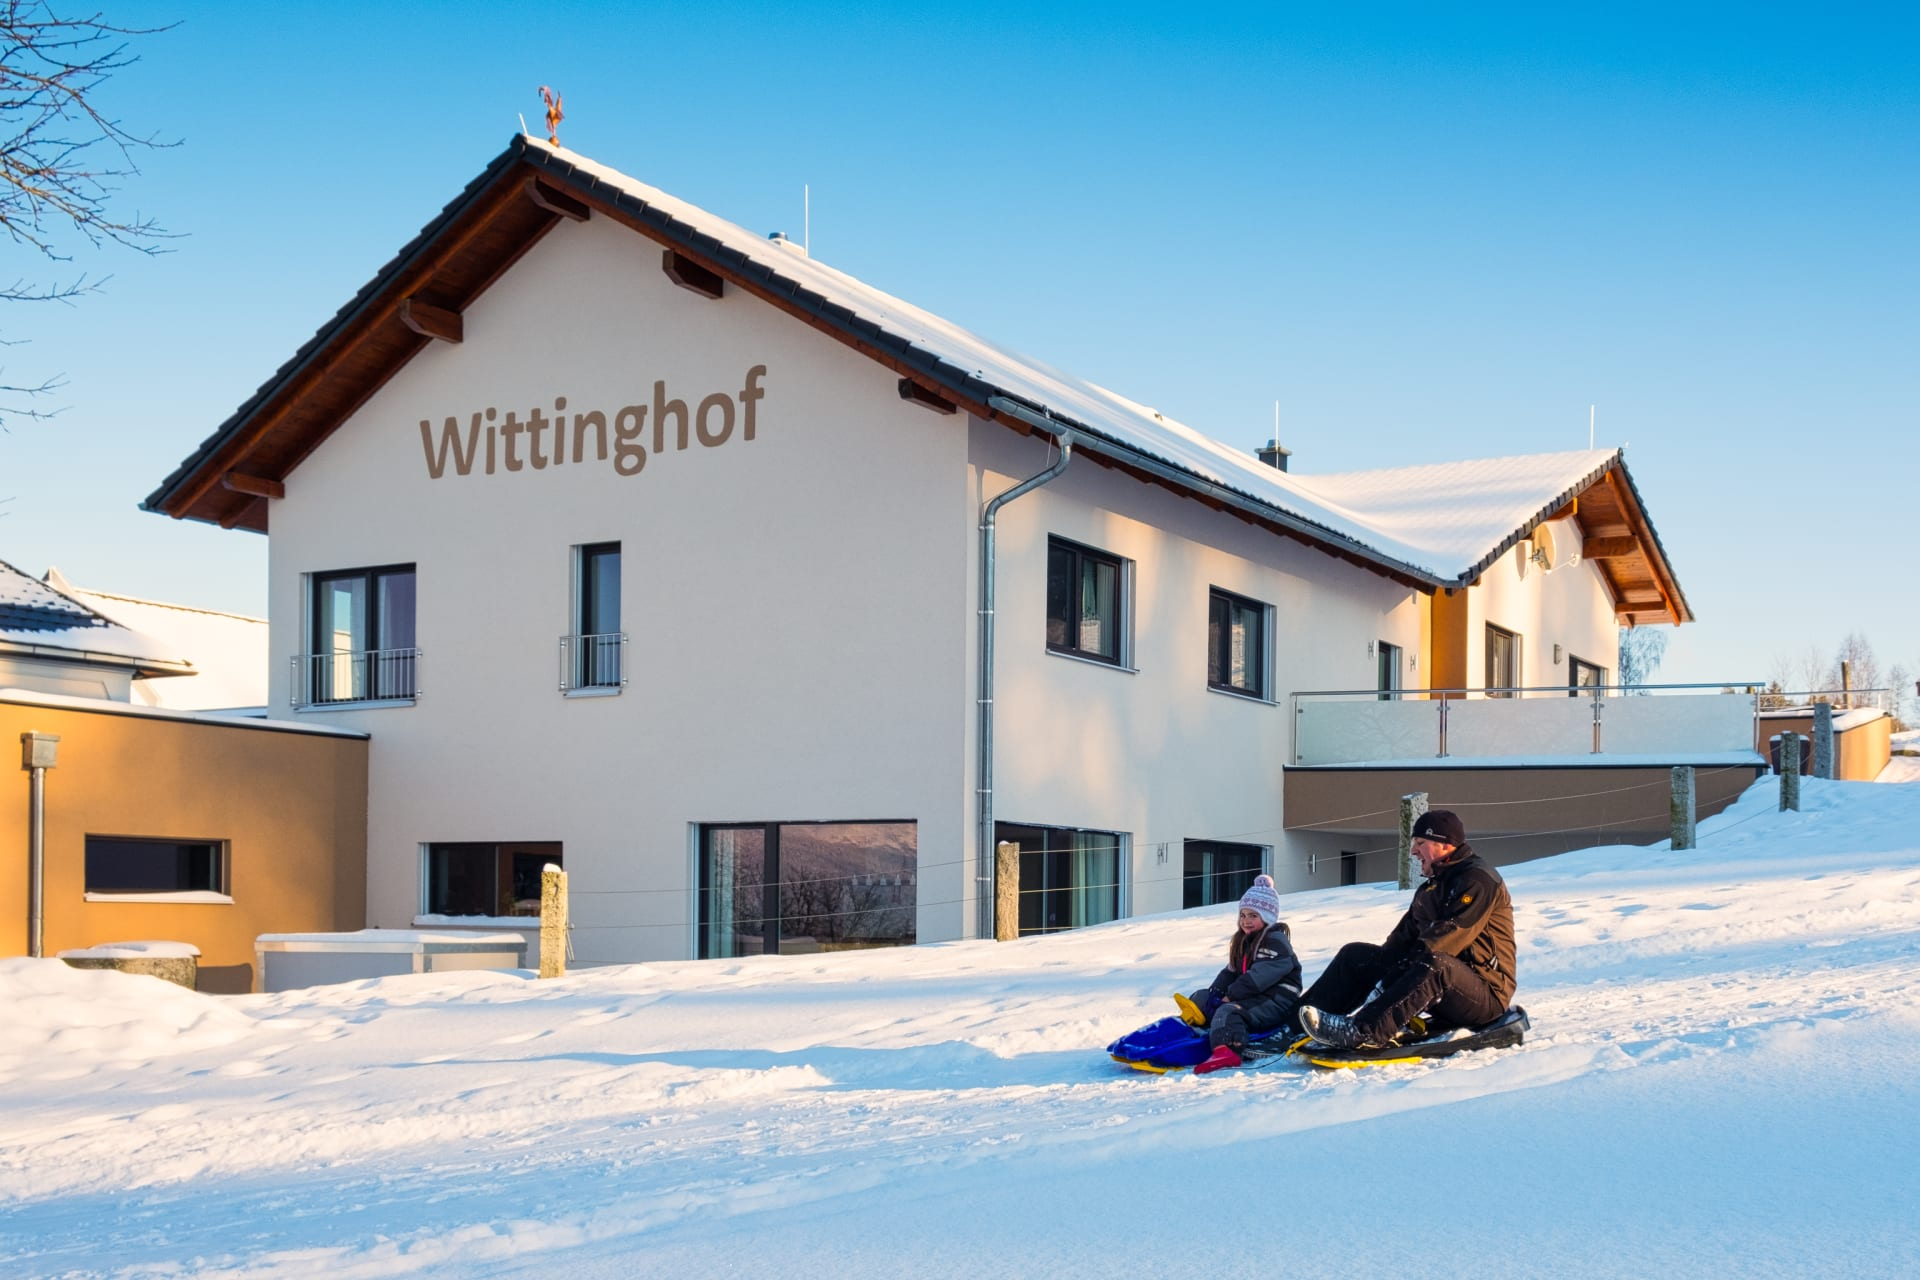 Wittinghof